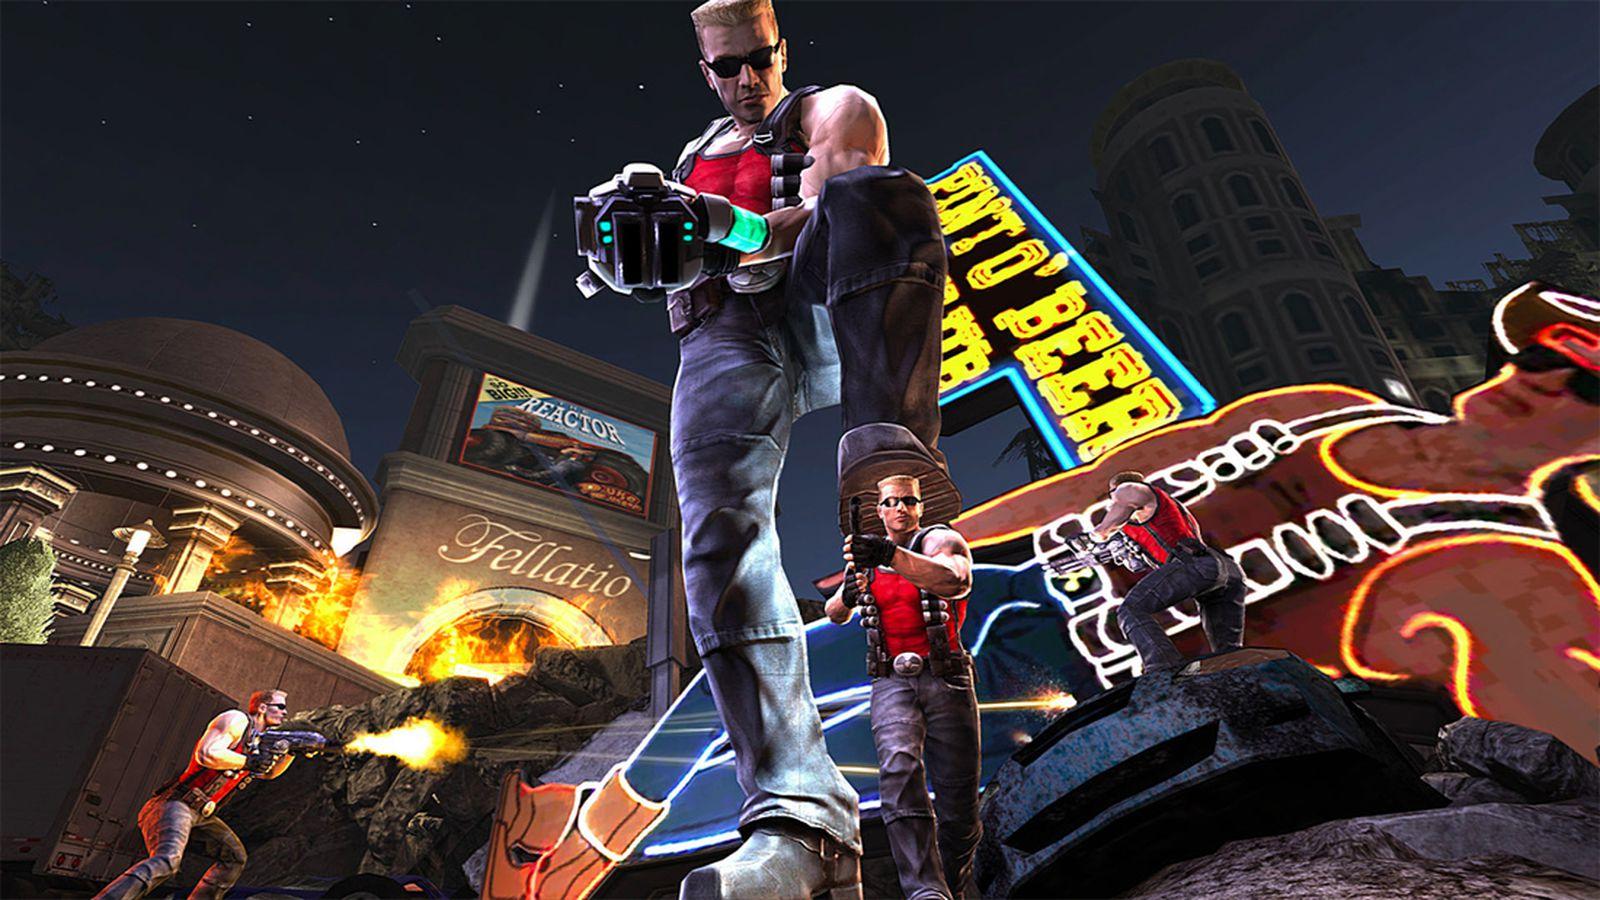 3d Action Game Wallpaper 3d Realms Fires Back At Gearbox Duke Nukem Lawsuit Polygon